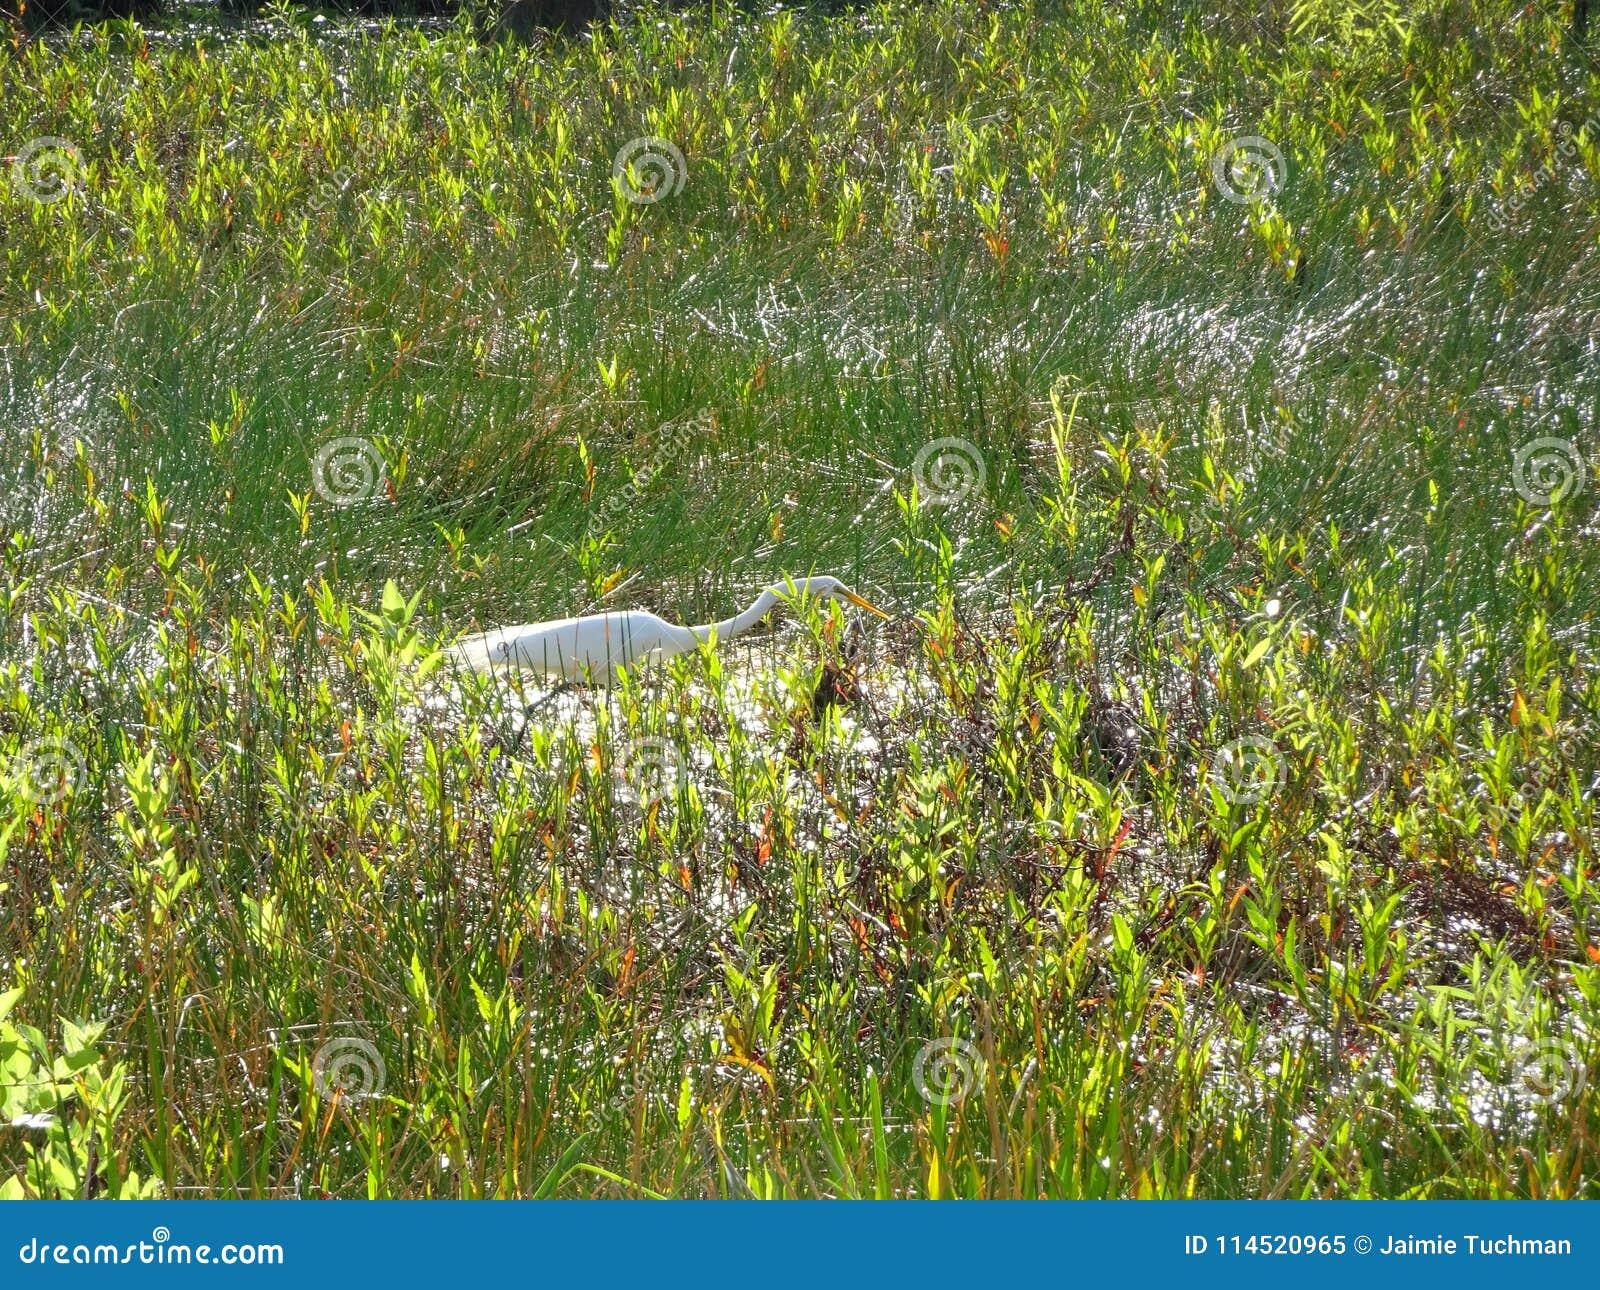 white bird walking in the swamp